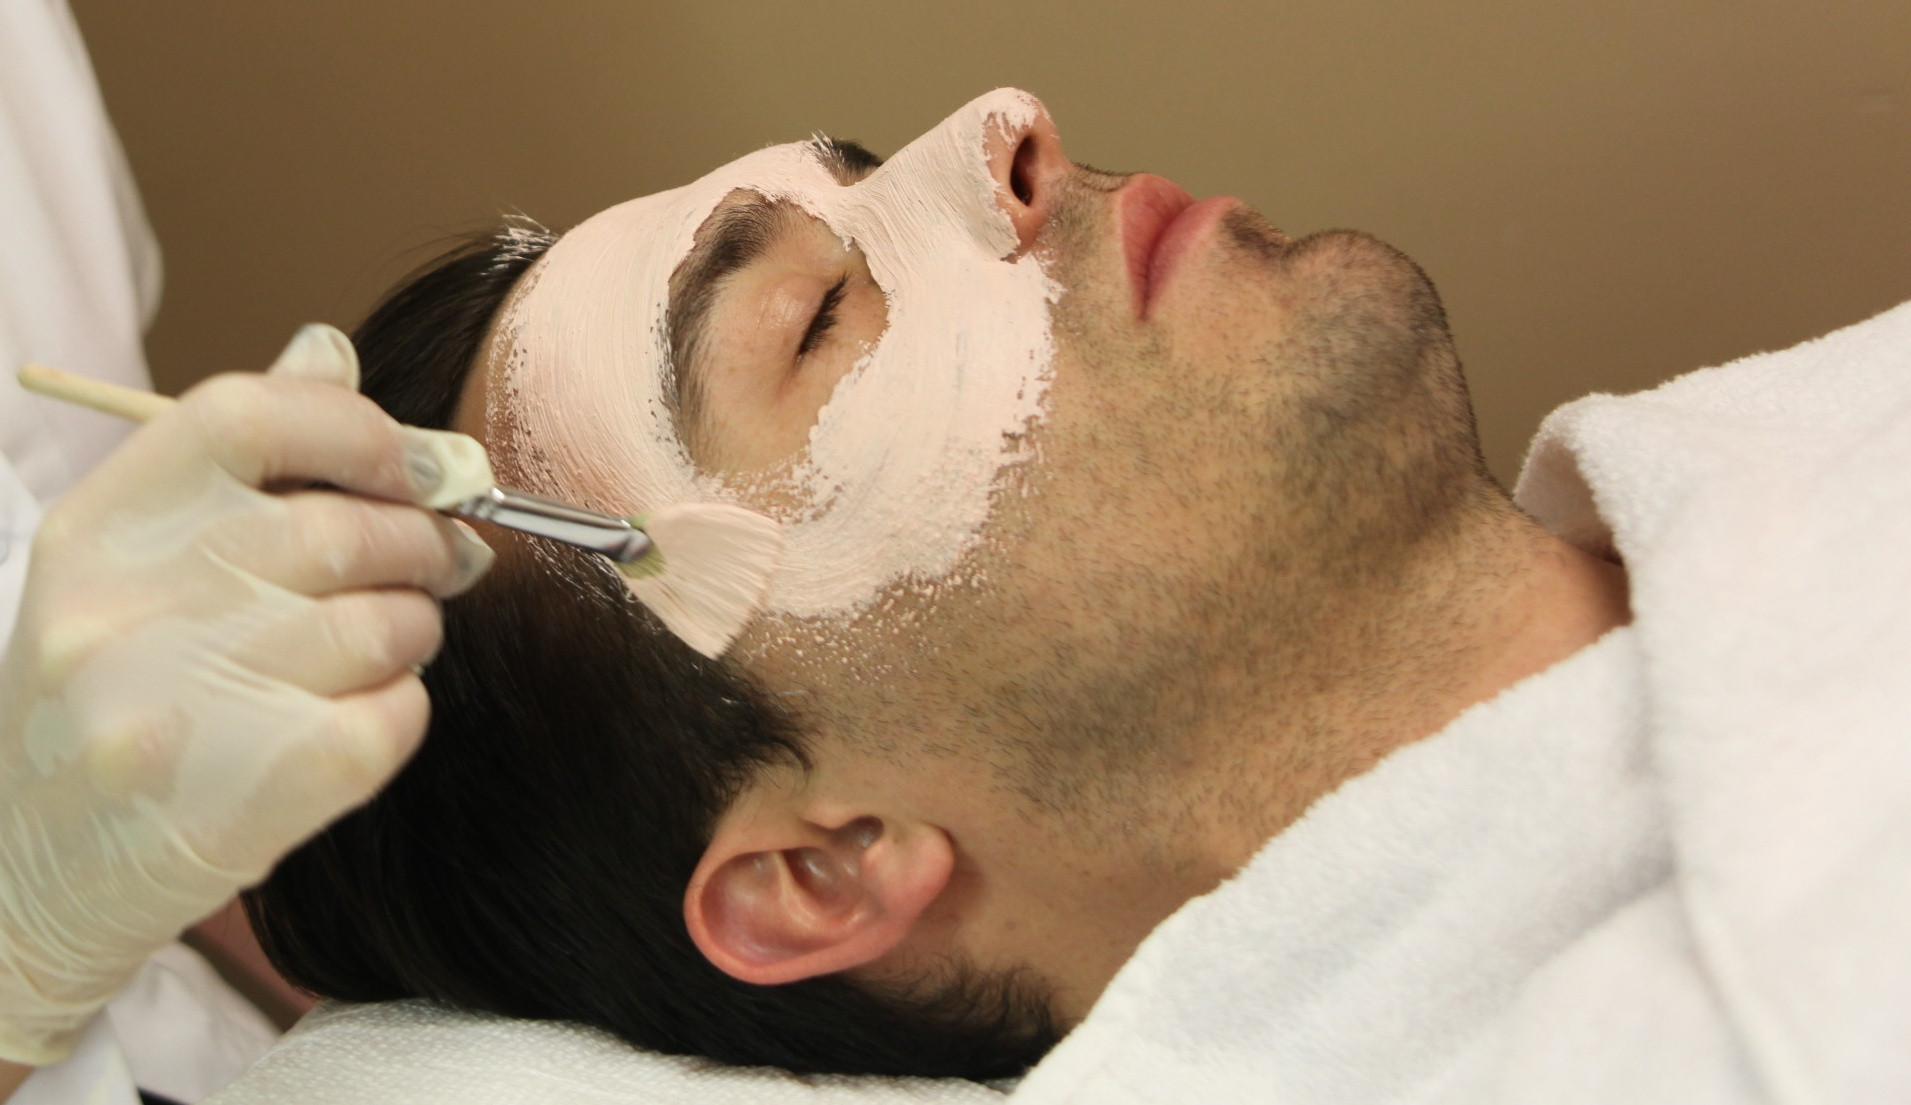 Men's face mask, facial cleansing